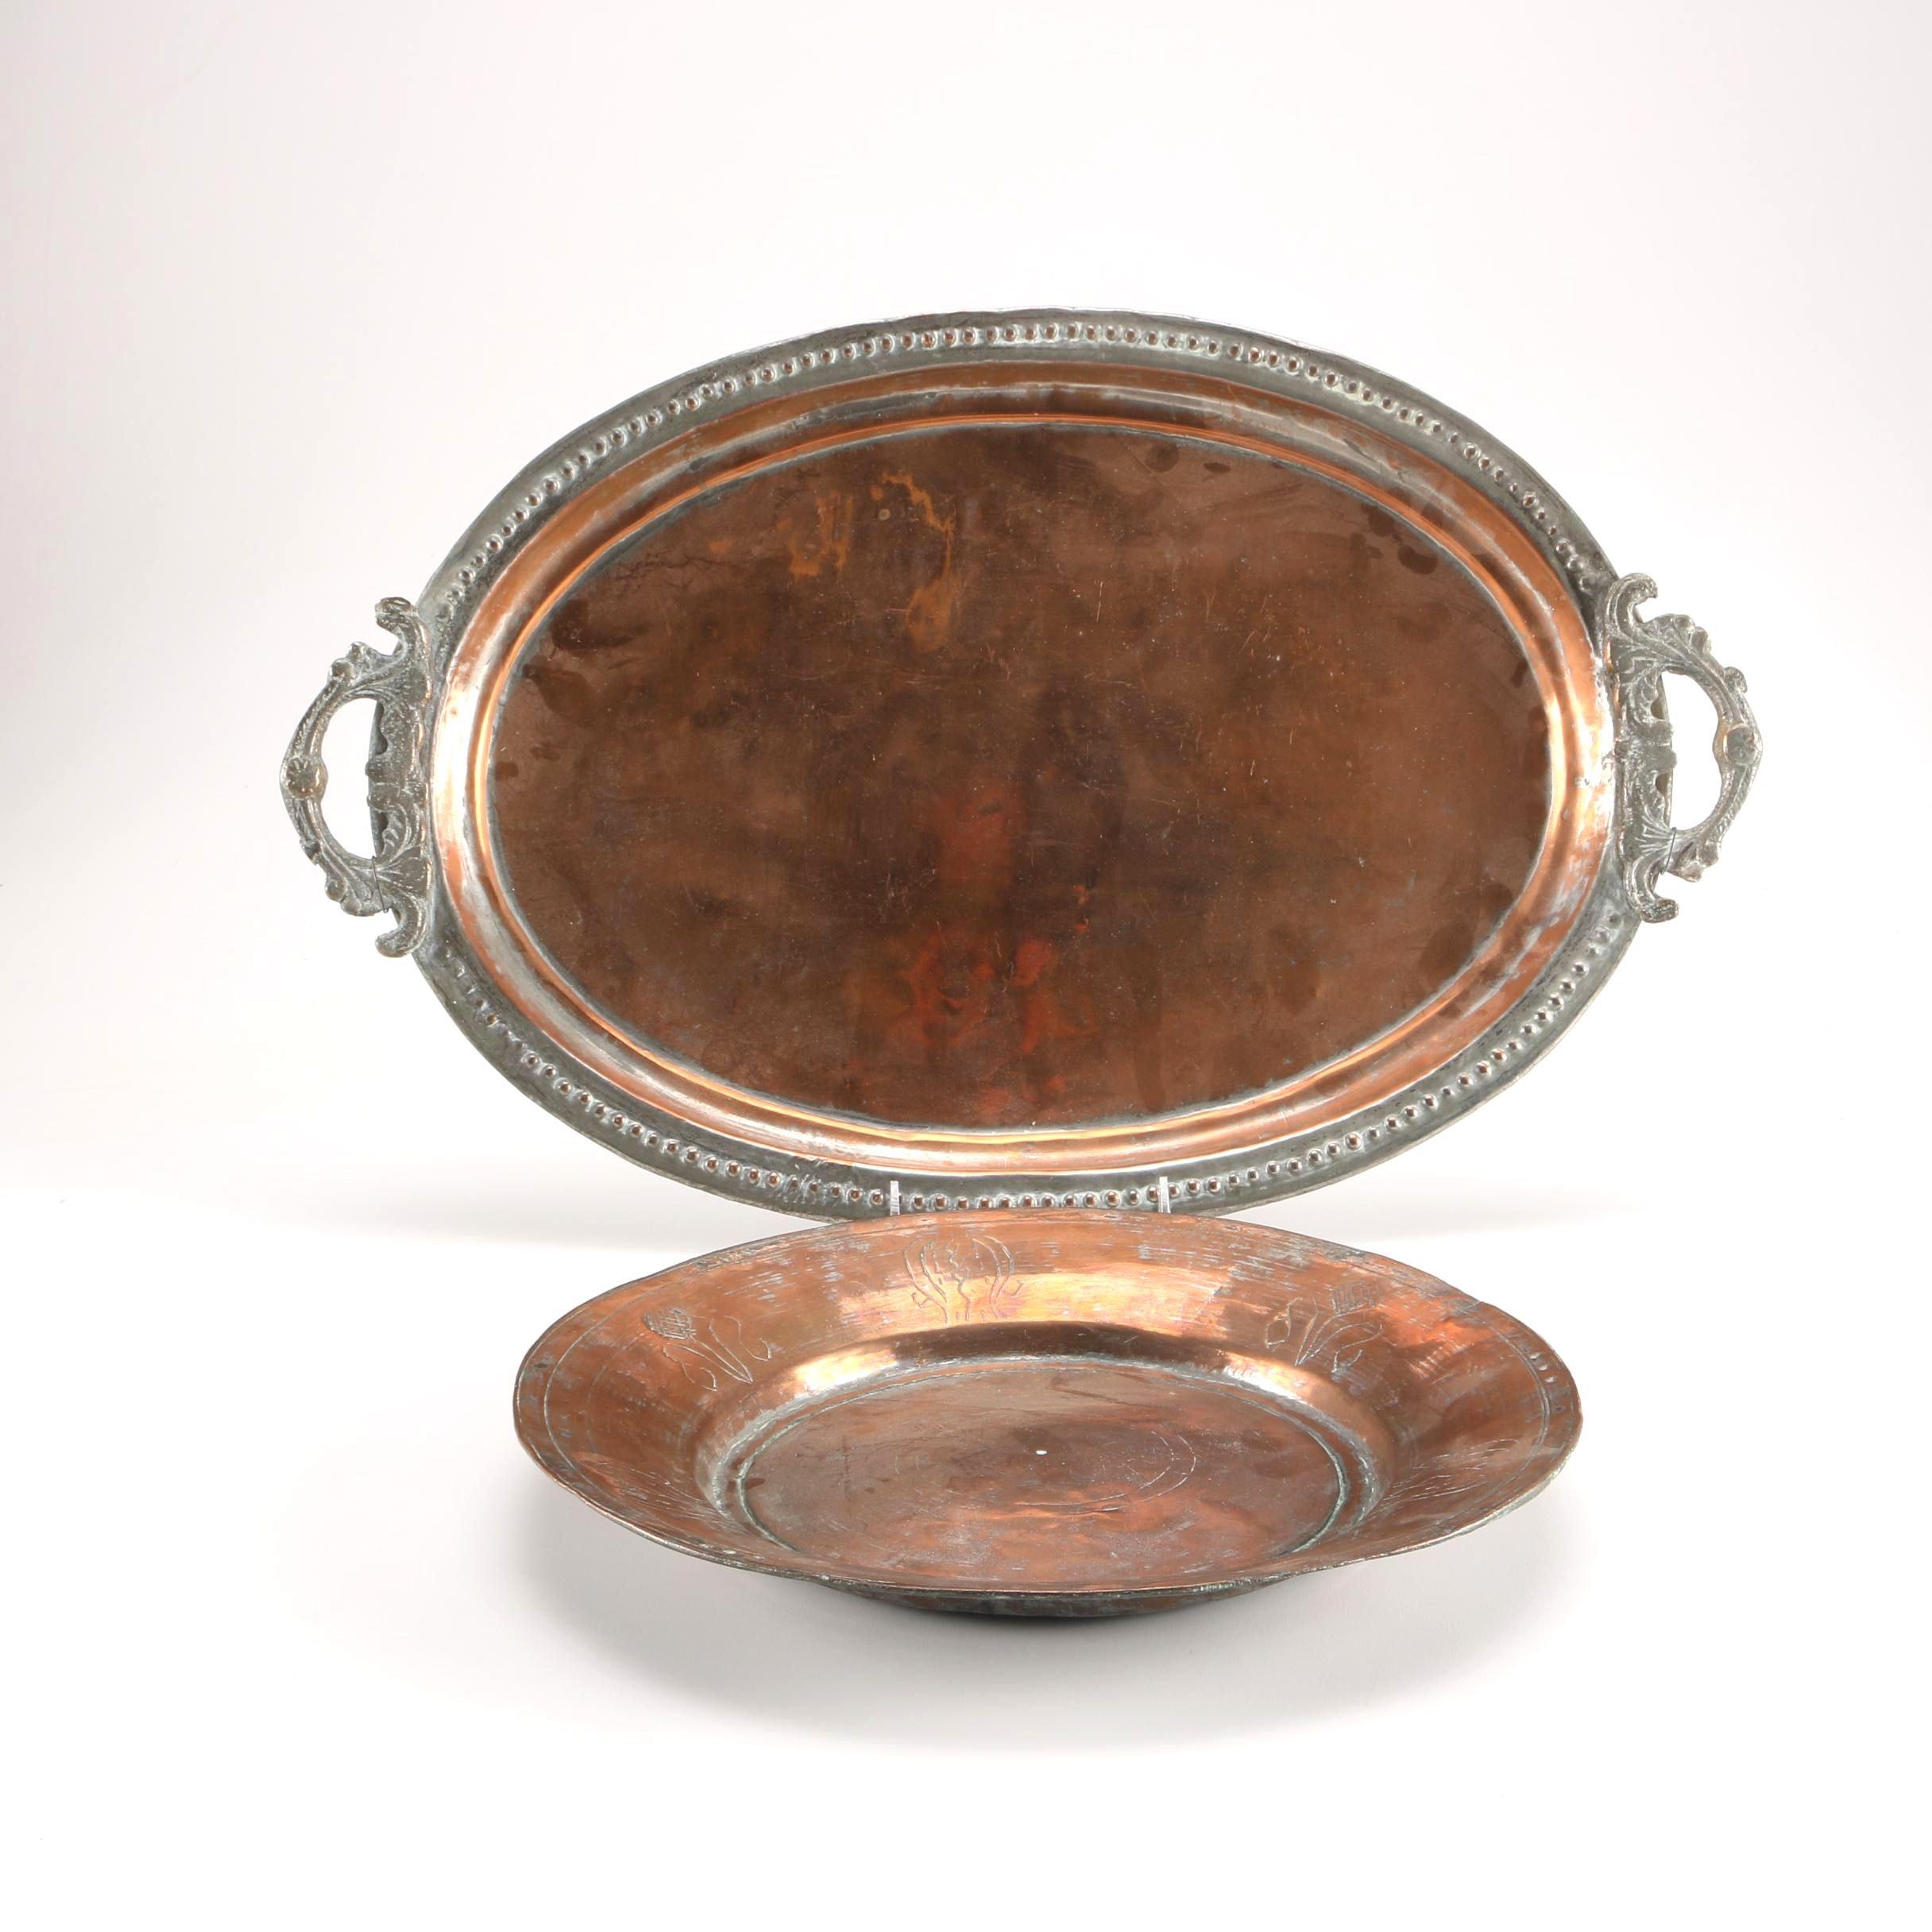 Brass and Steel Servingware